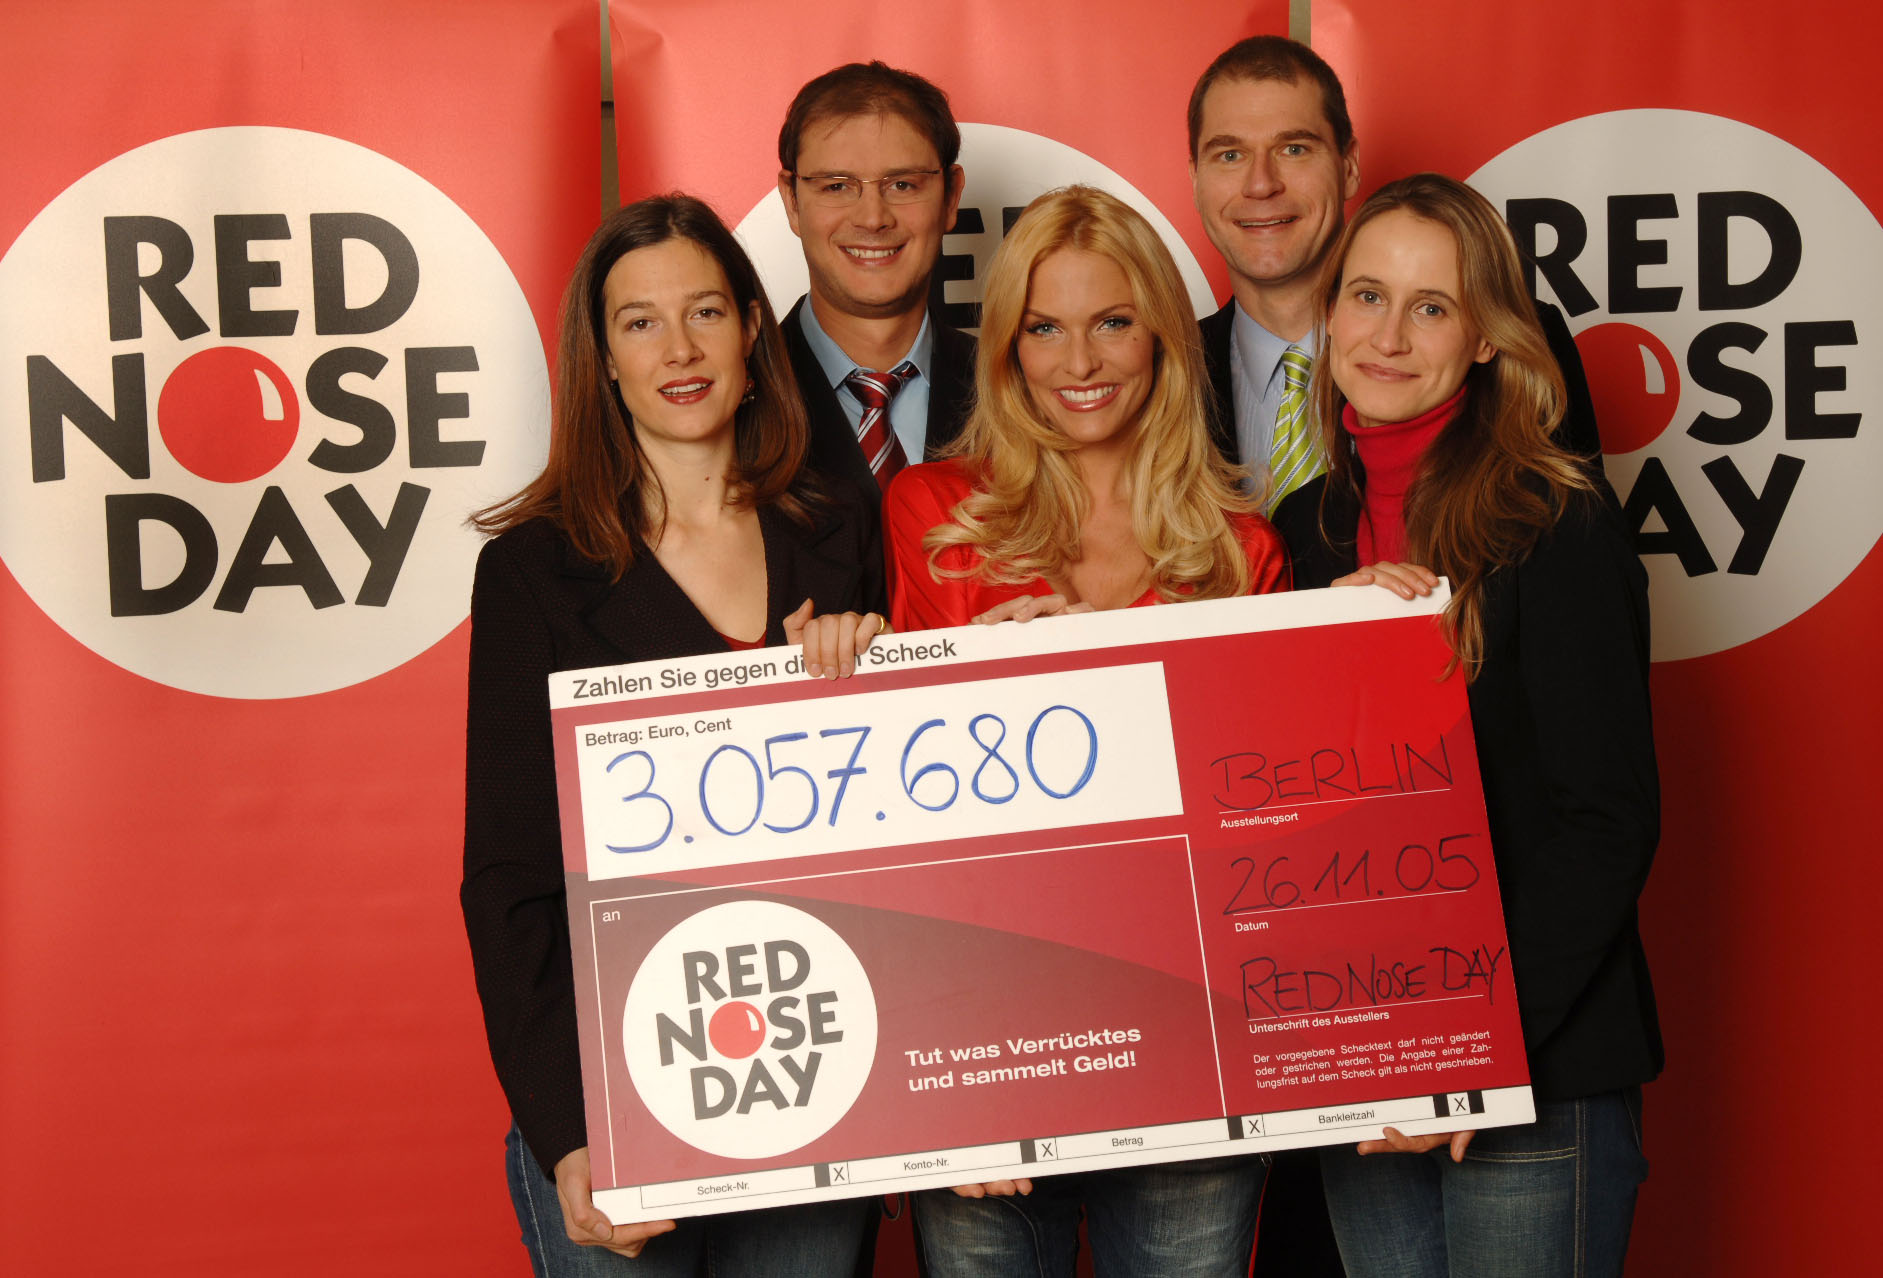 Red nose day 2005 ber drei millionen euro f r kinder in for Zdf moderatorin schlaganfall